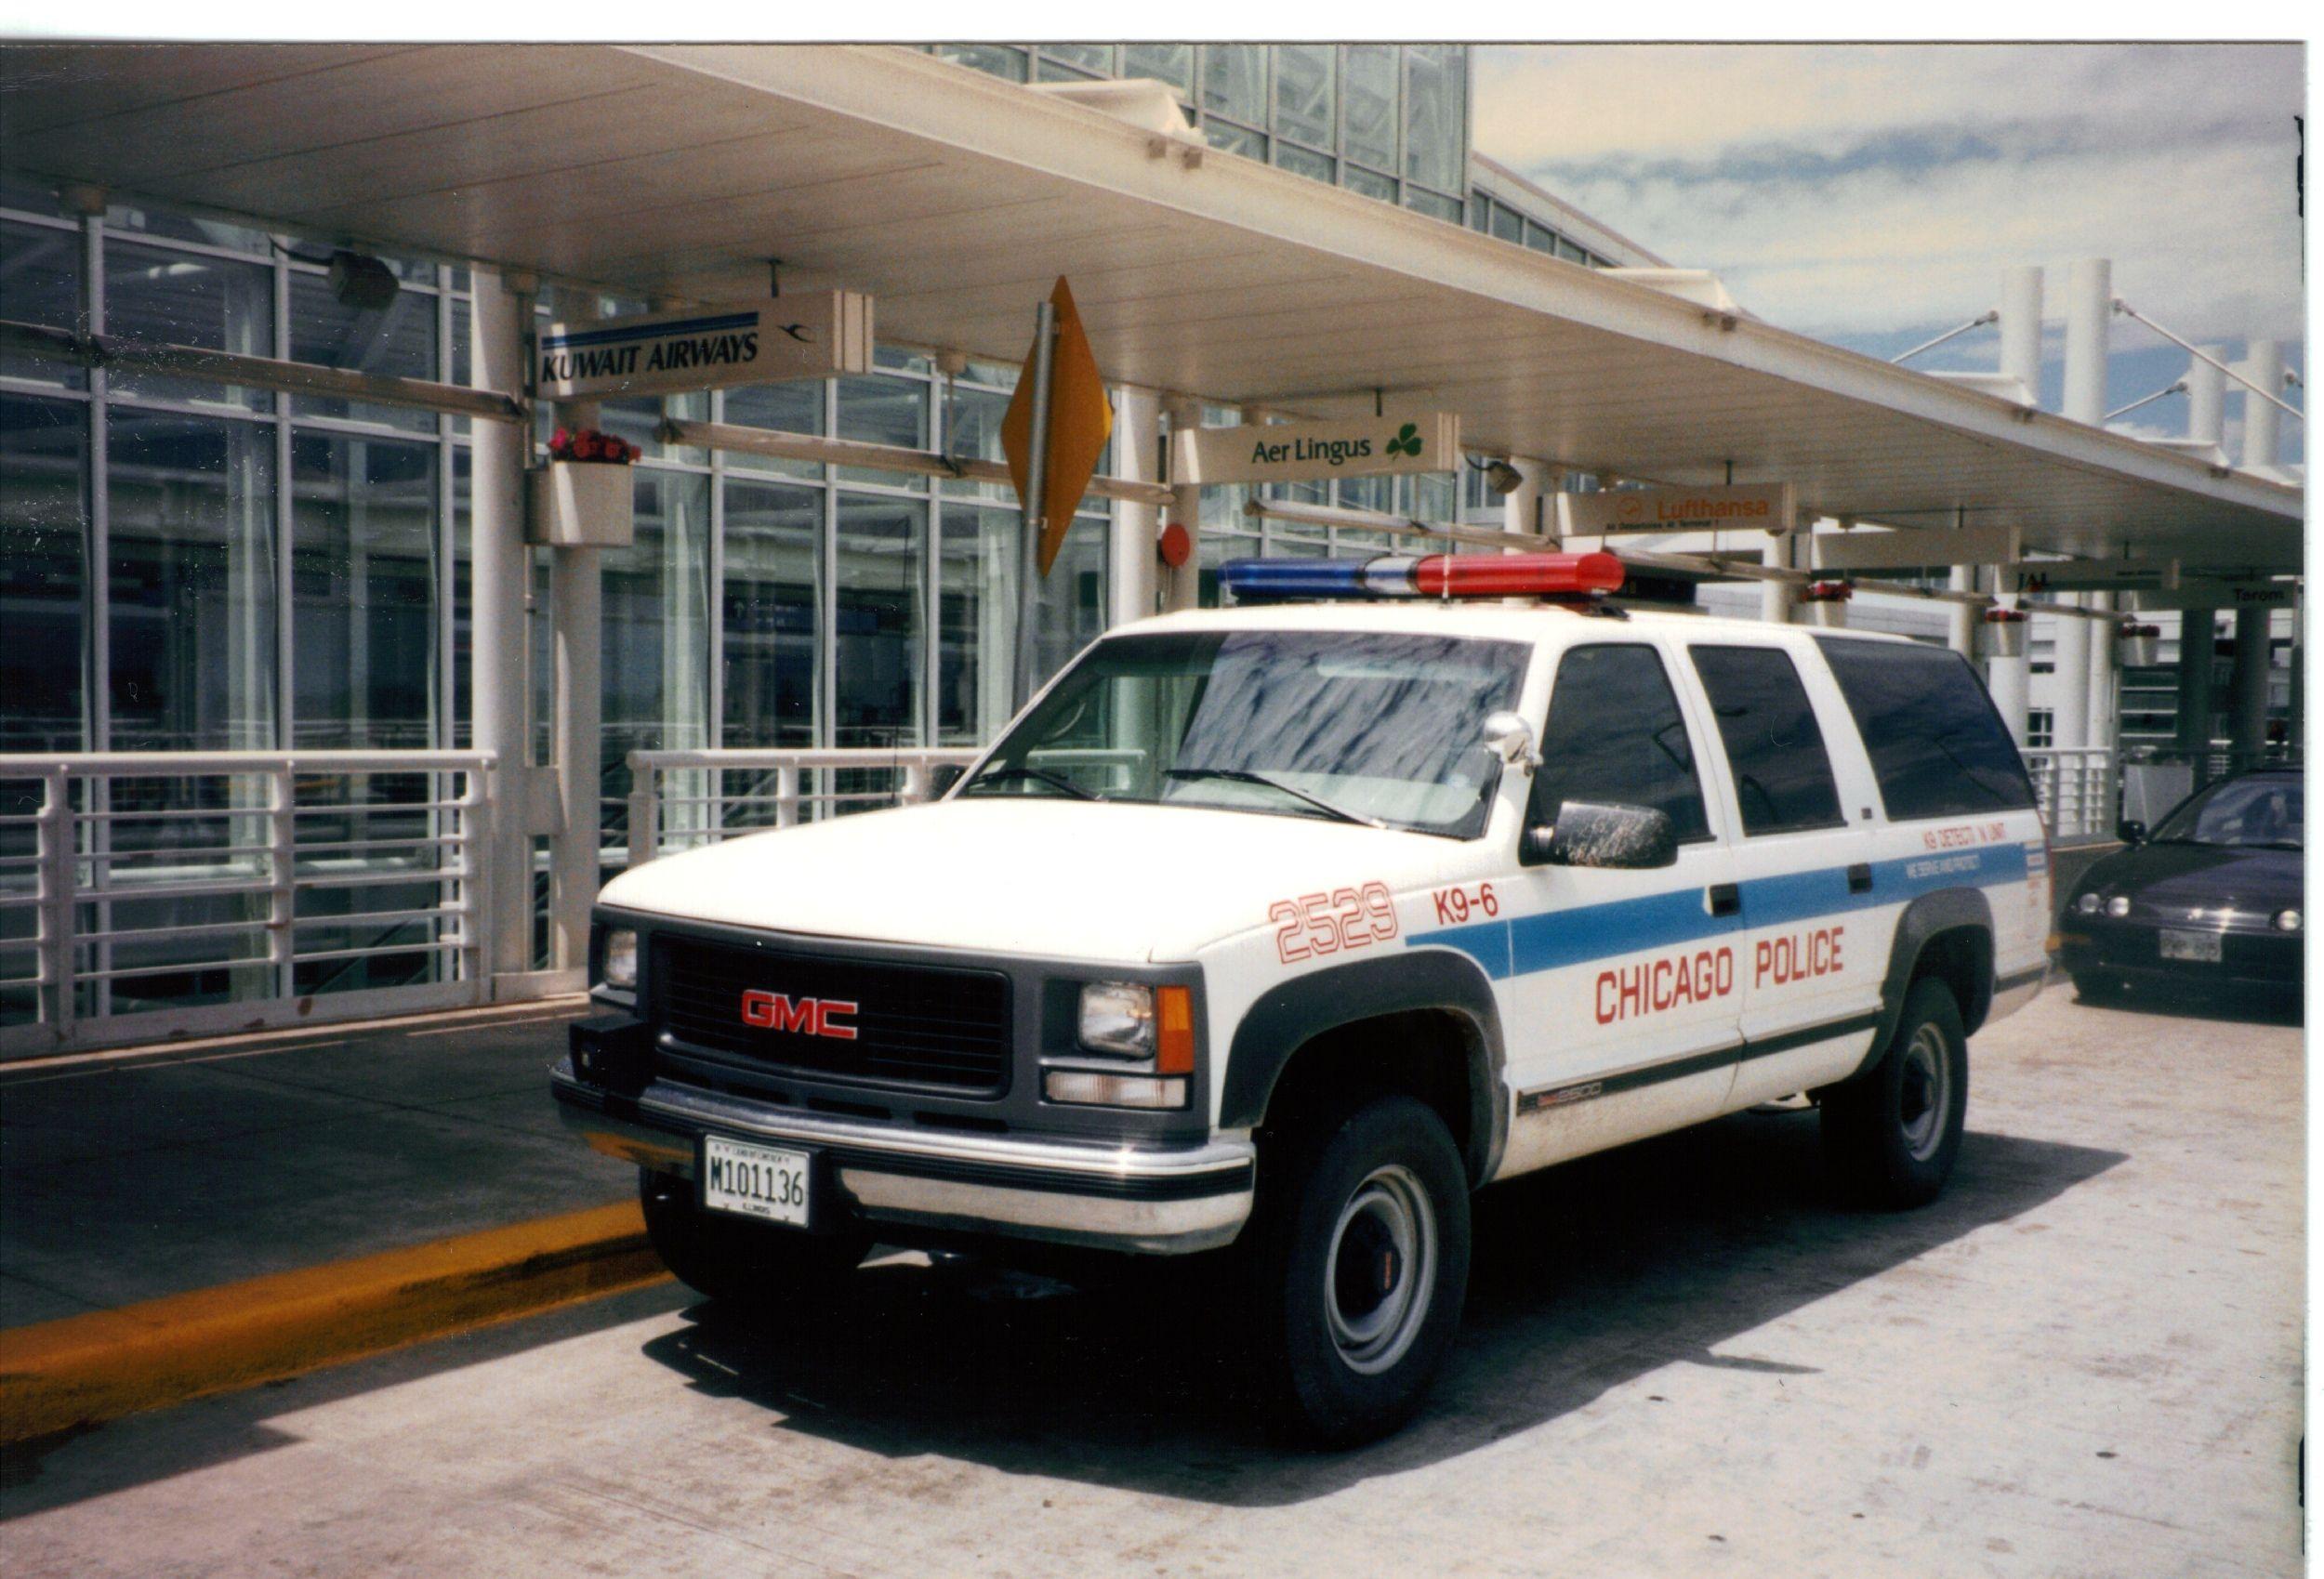 1995 Gmc Yukon O Hare Airport K9 Unit Gmc Yukon Chicago Police K9 Airport 1995 Classic Retro Vintag Police Cars Chevrolet Suburban Chevy Suburban